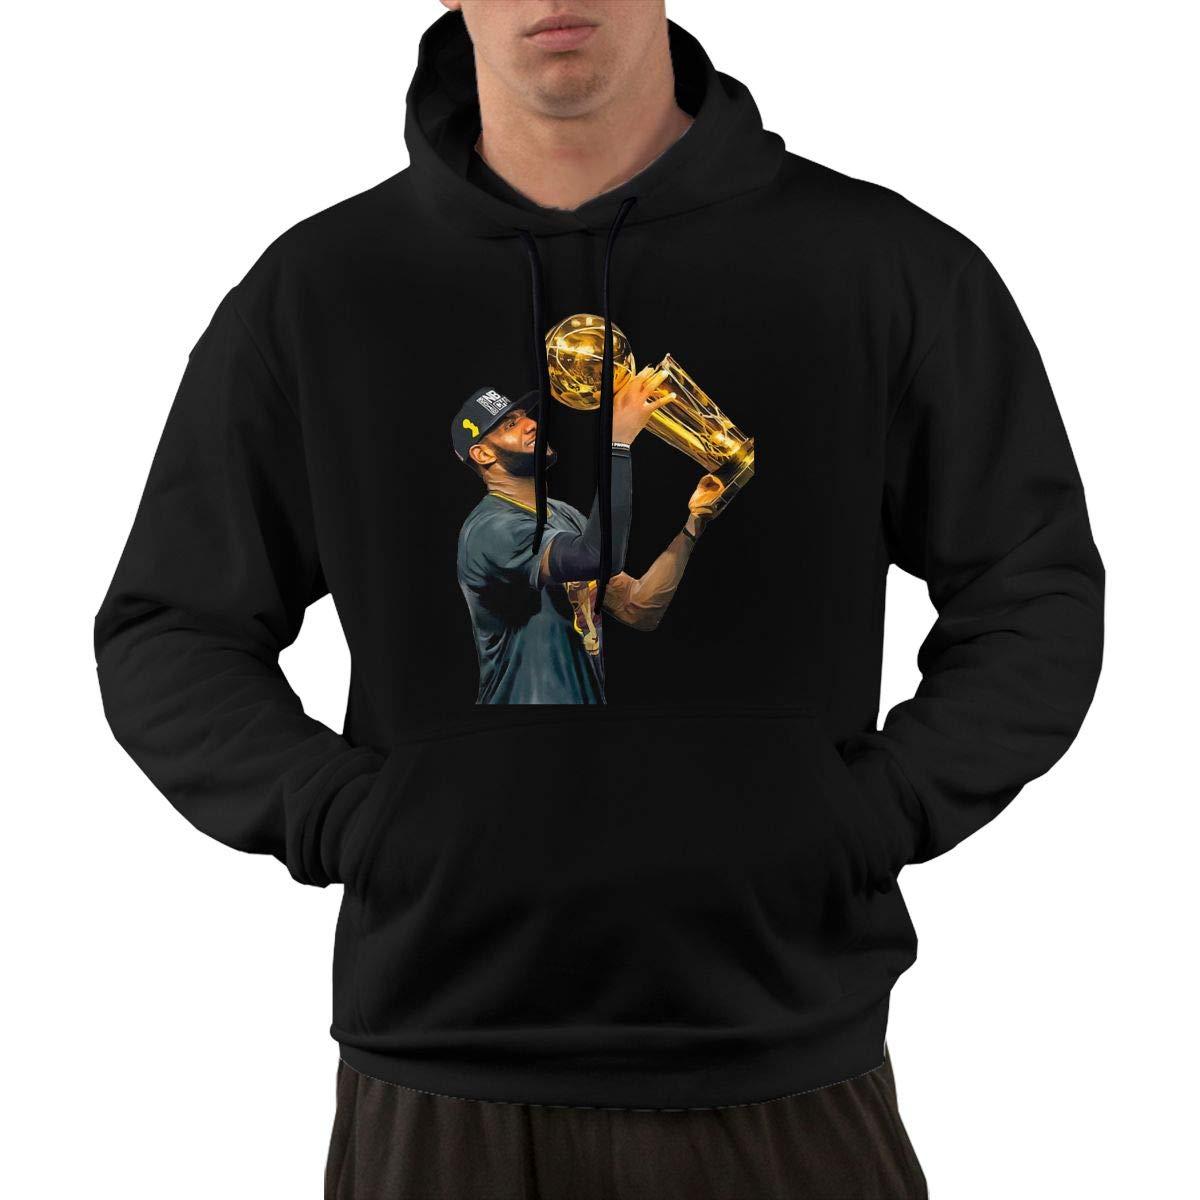 Basketball Clothing Leb Ron Jam Es Champions Hooded 8434 Shirts